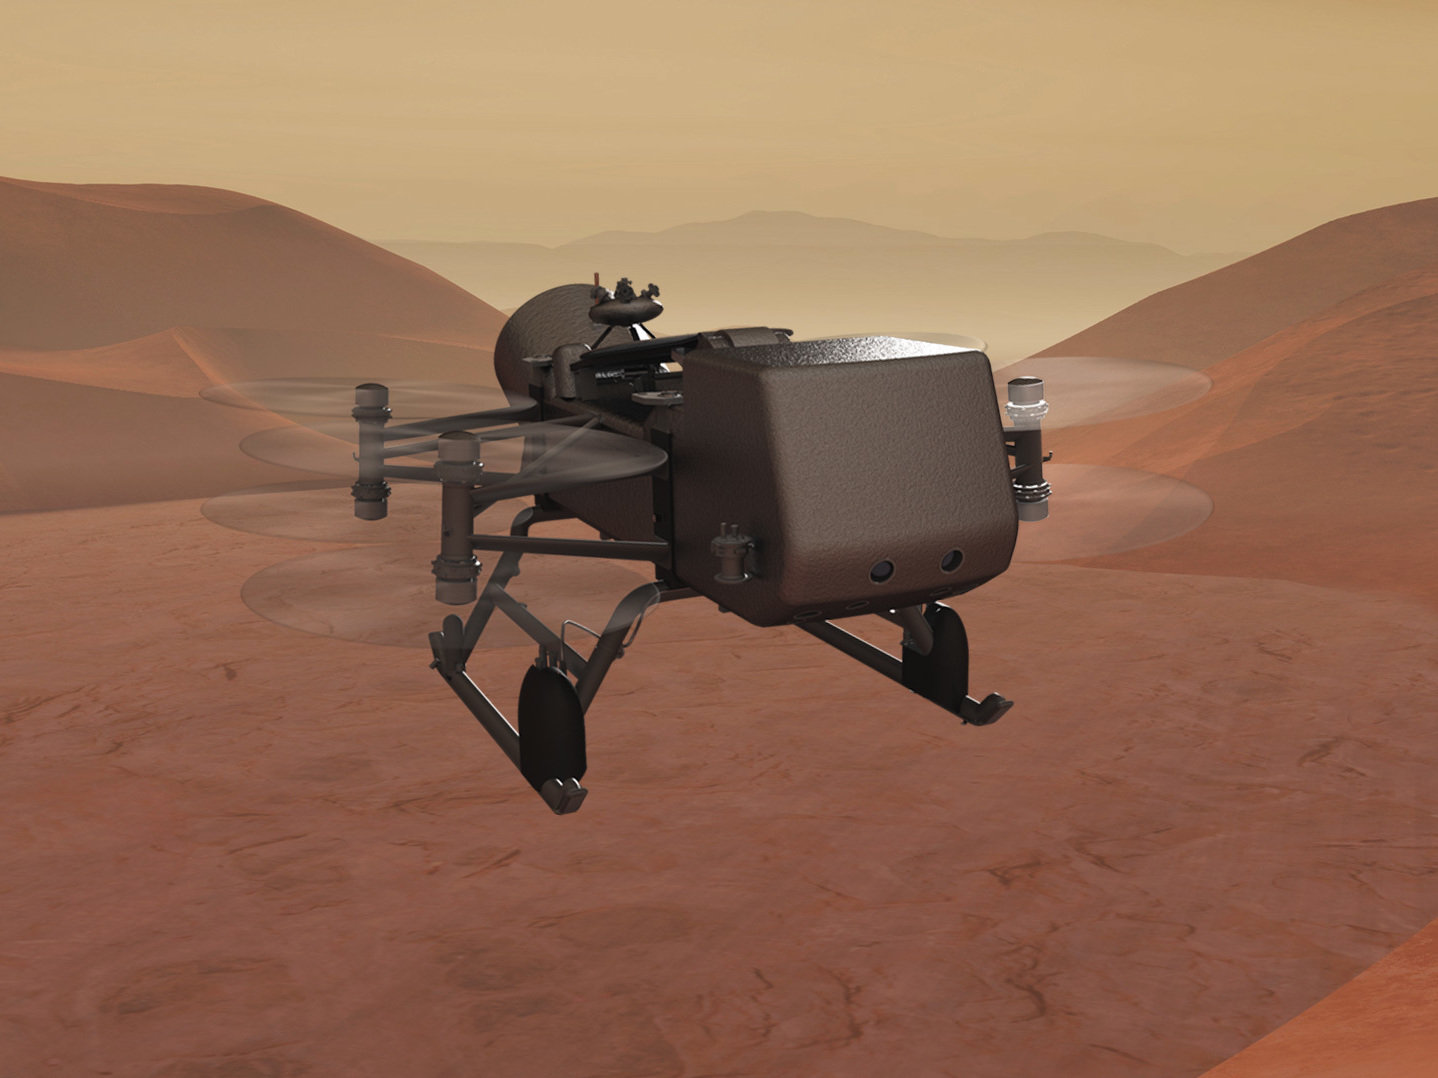 Dragonfly Drone NASA Titan